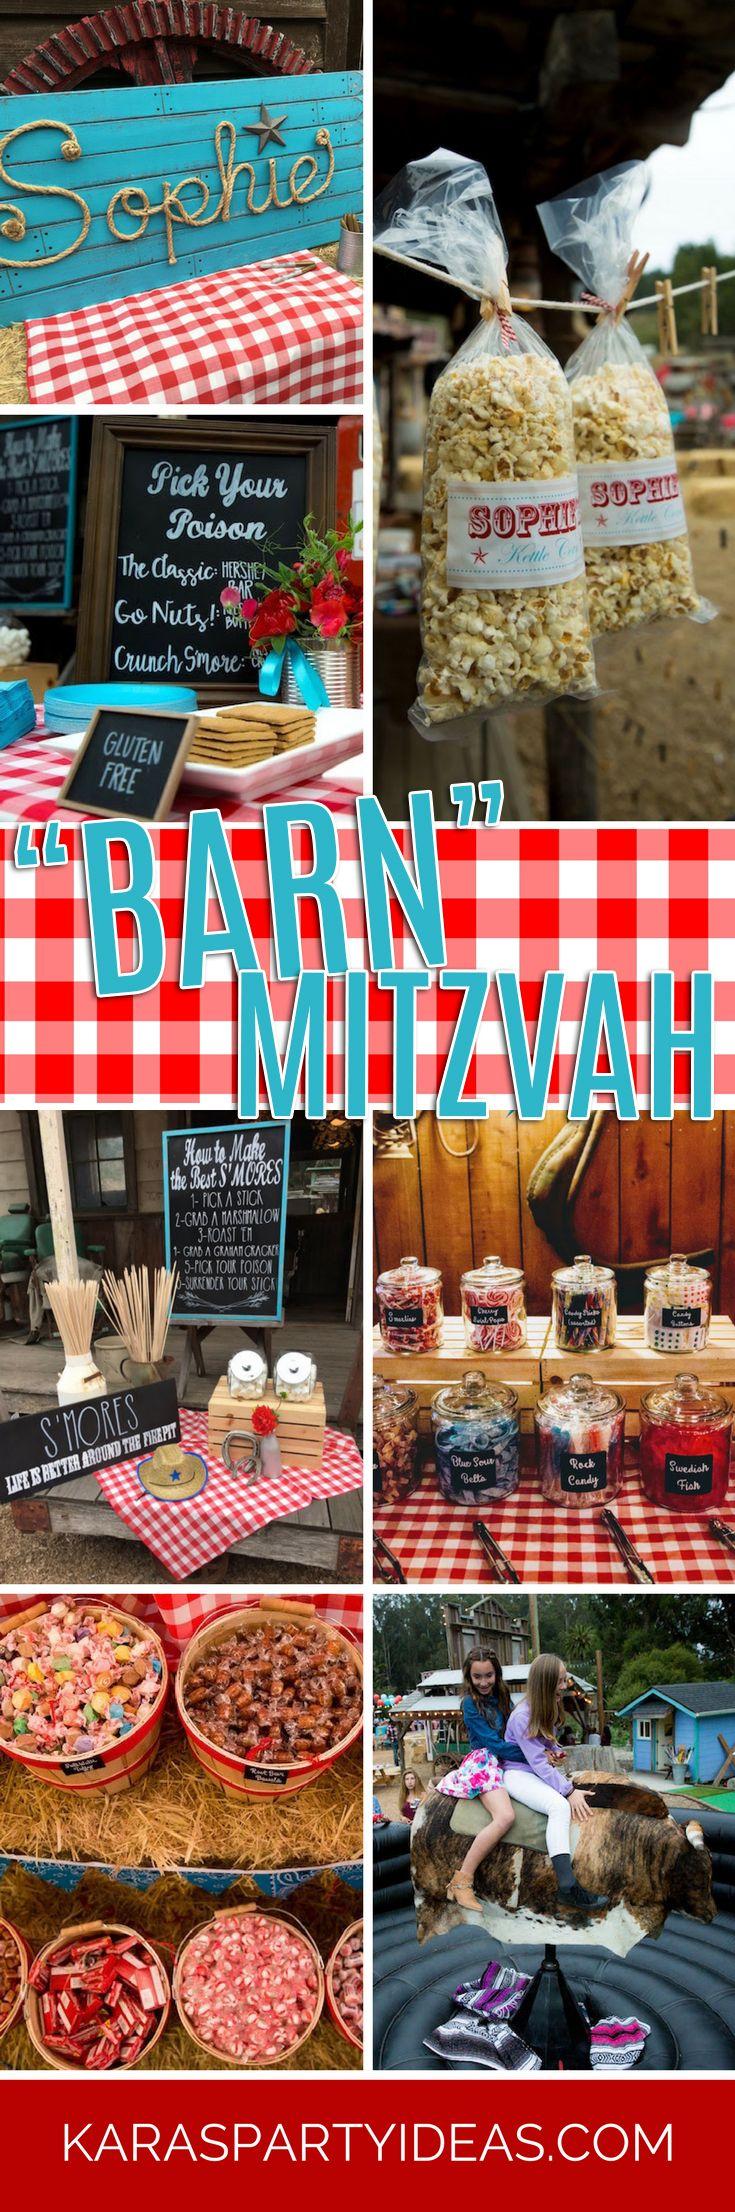 Kara s party ideas rustic country barn wedding party ideas supplies -  Barn Mitzvah A Barnyard Themed Bat Mitzvah Via Kara S Party Ideas